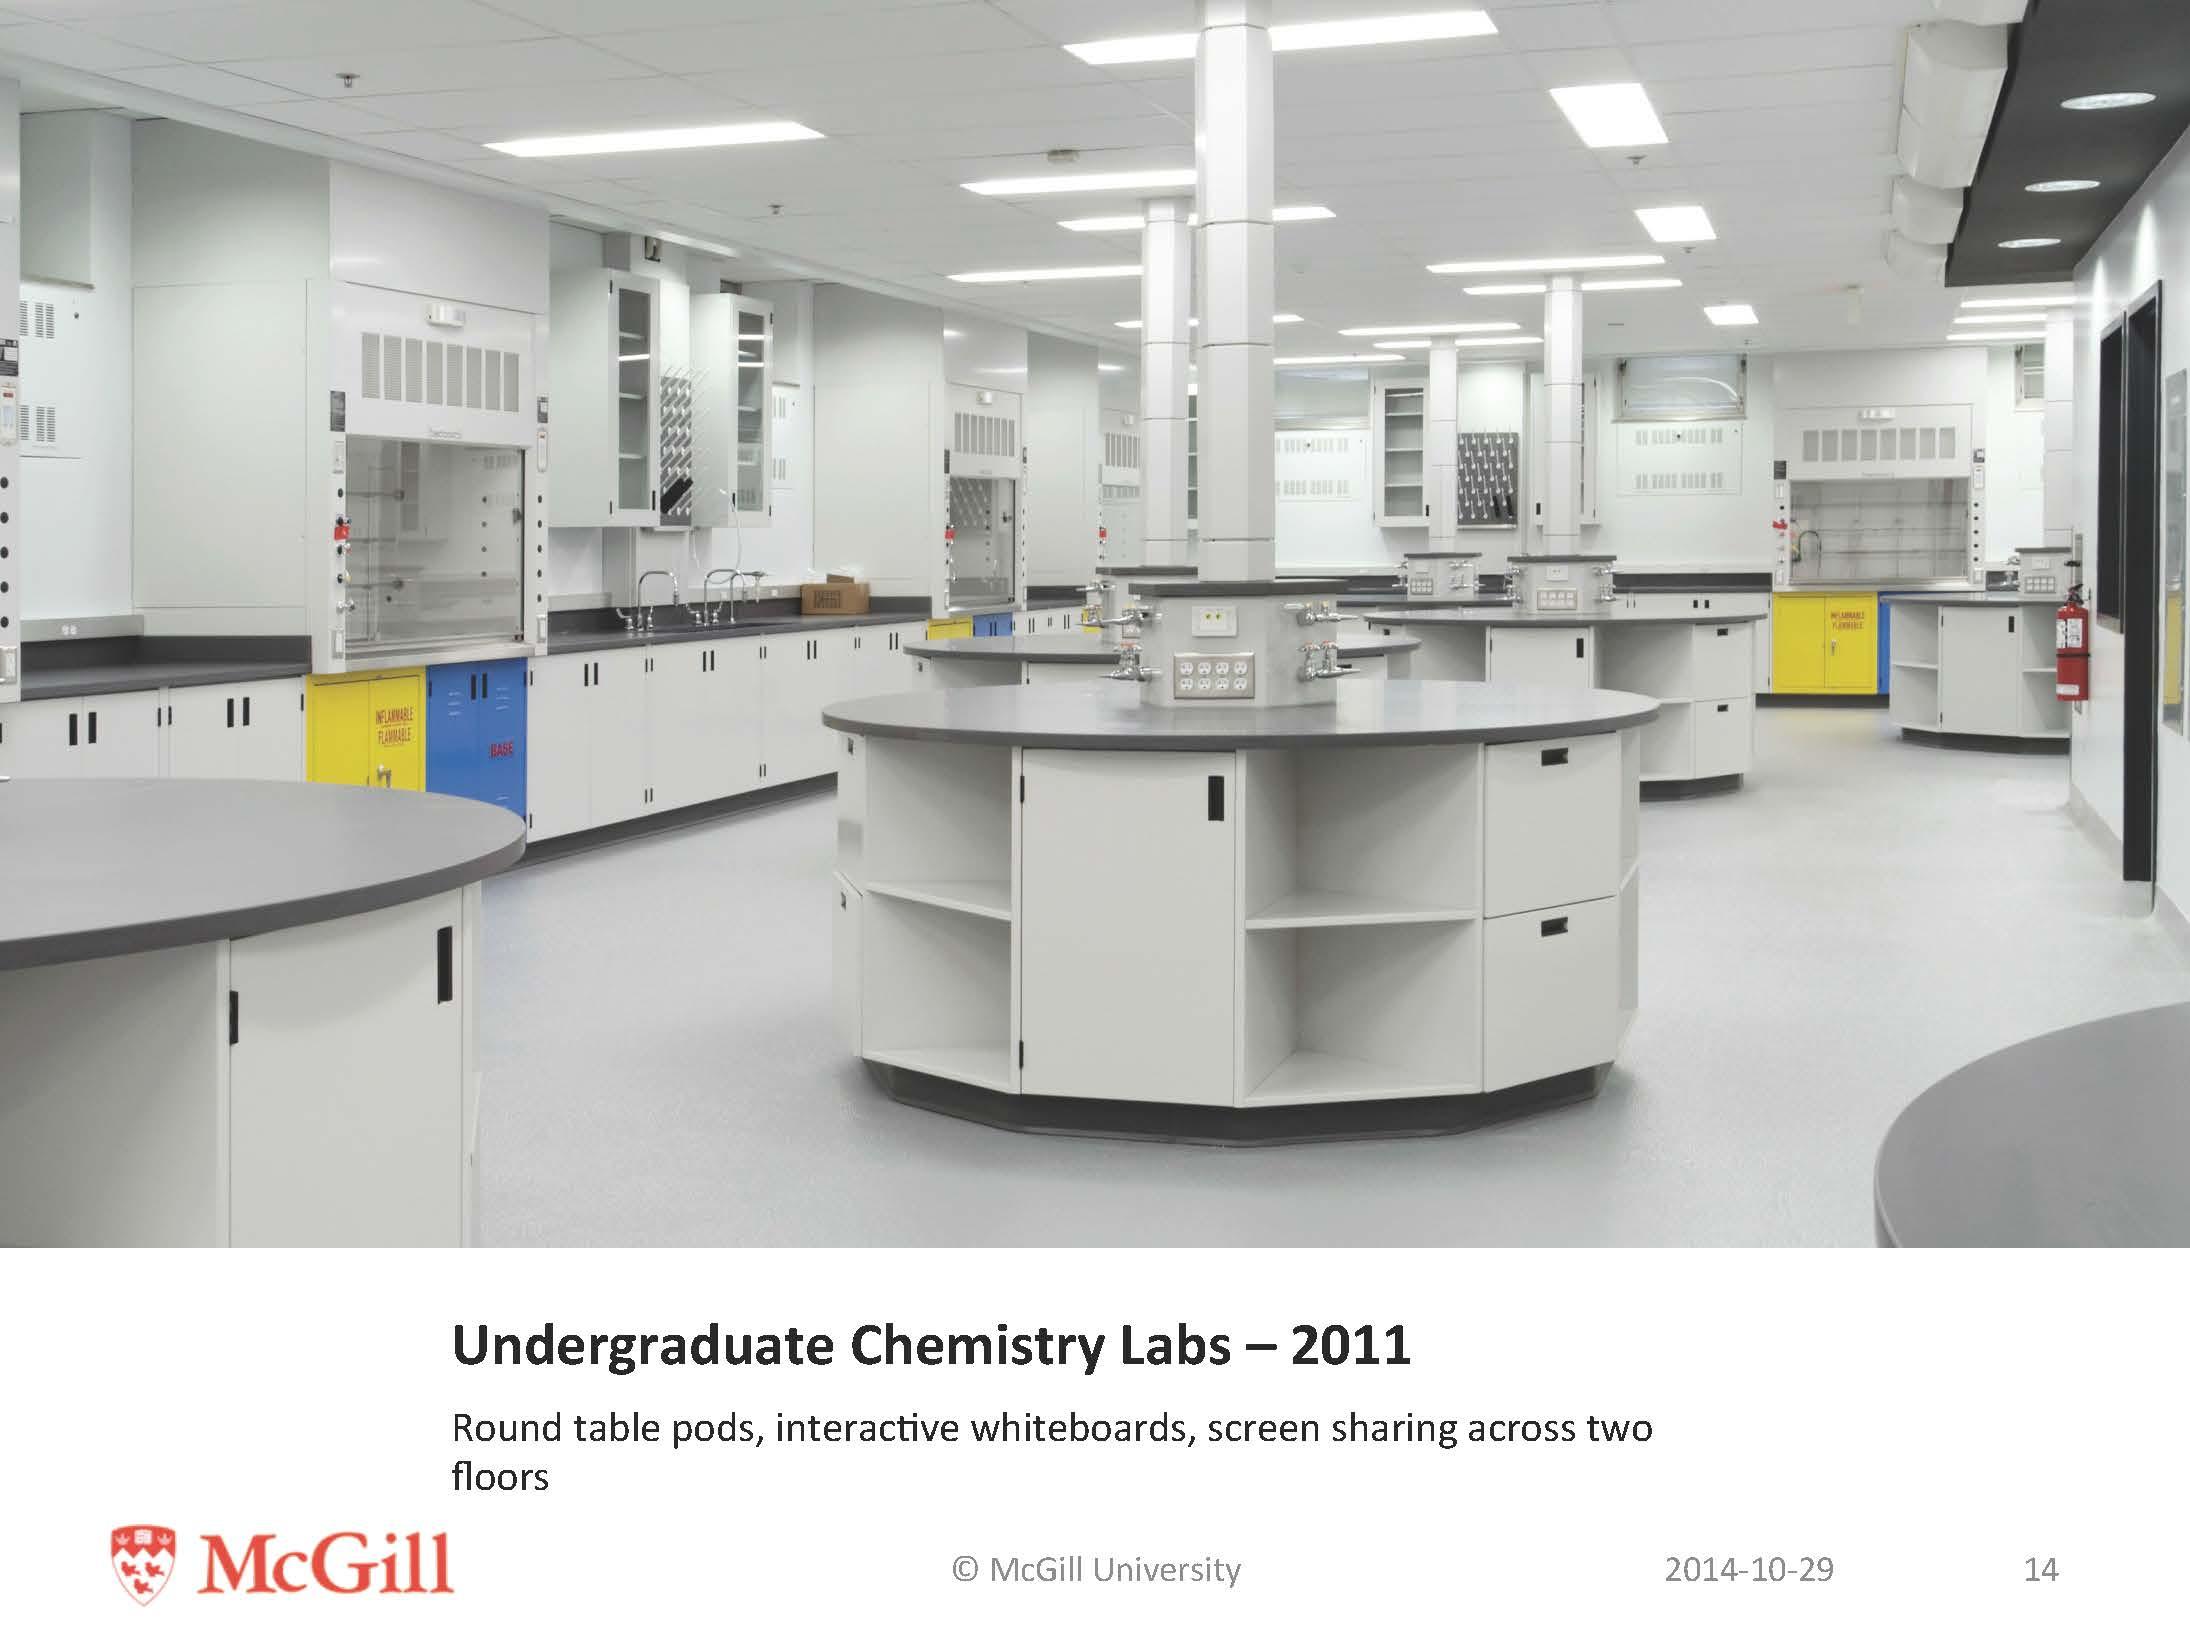 cava unit 06 lab report Professor robert j cava russell wellman moore professor of chemistry department of chemistry princeton university princeton, nj 08544 tel: (609) 258-0016.